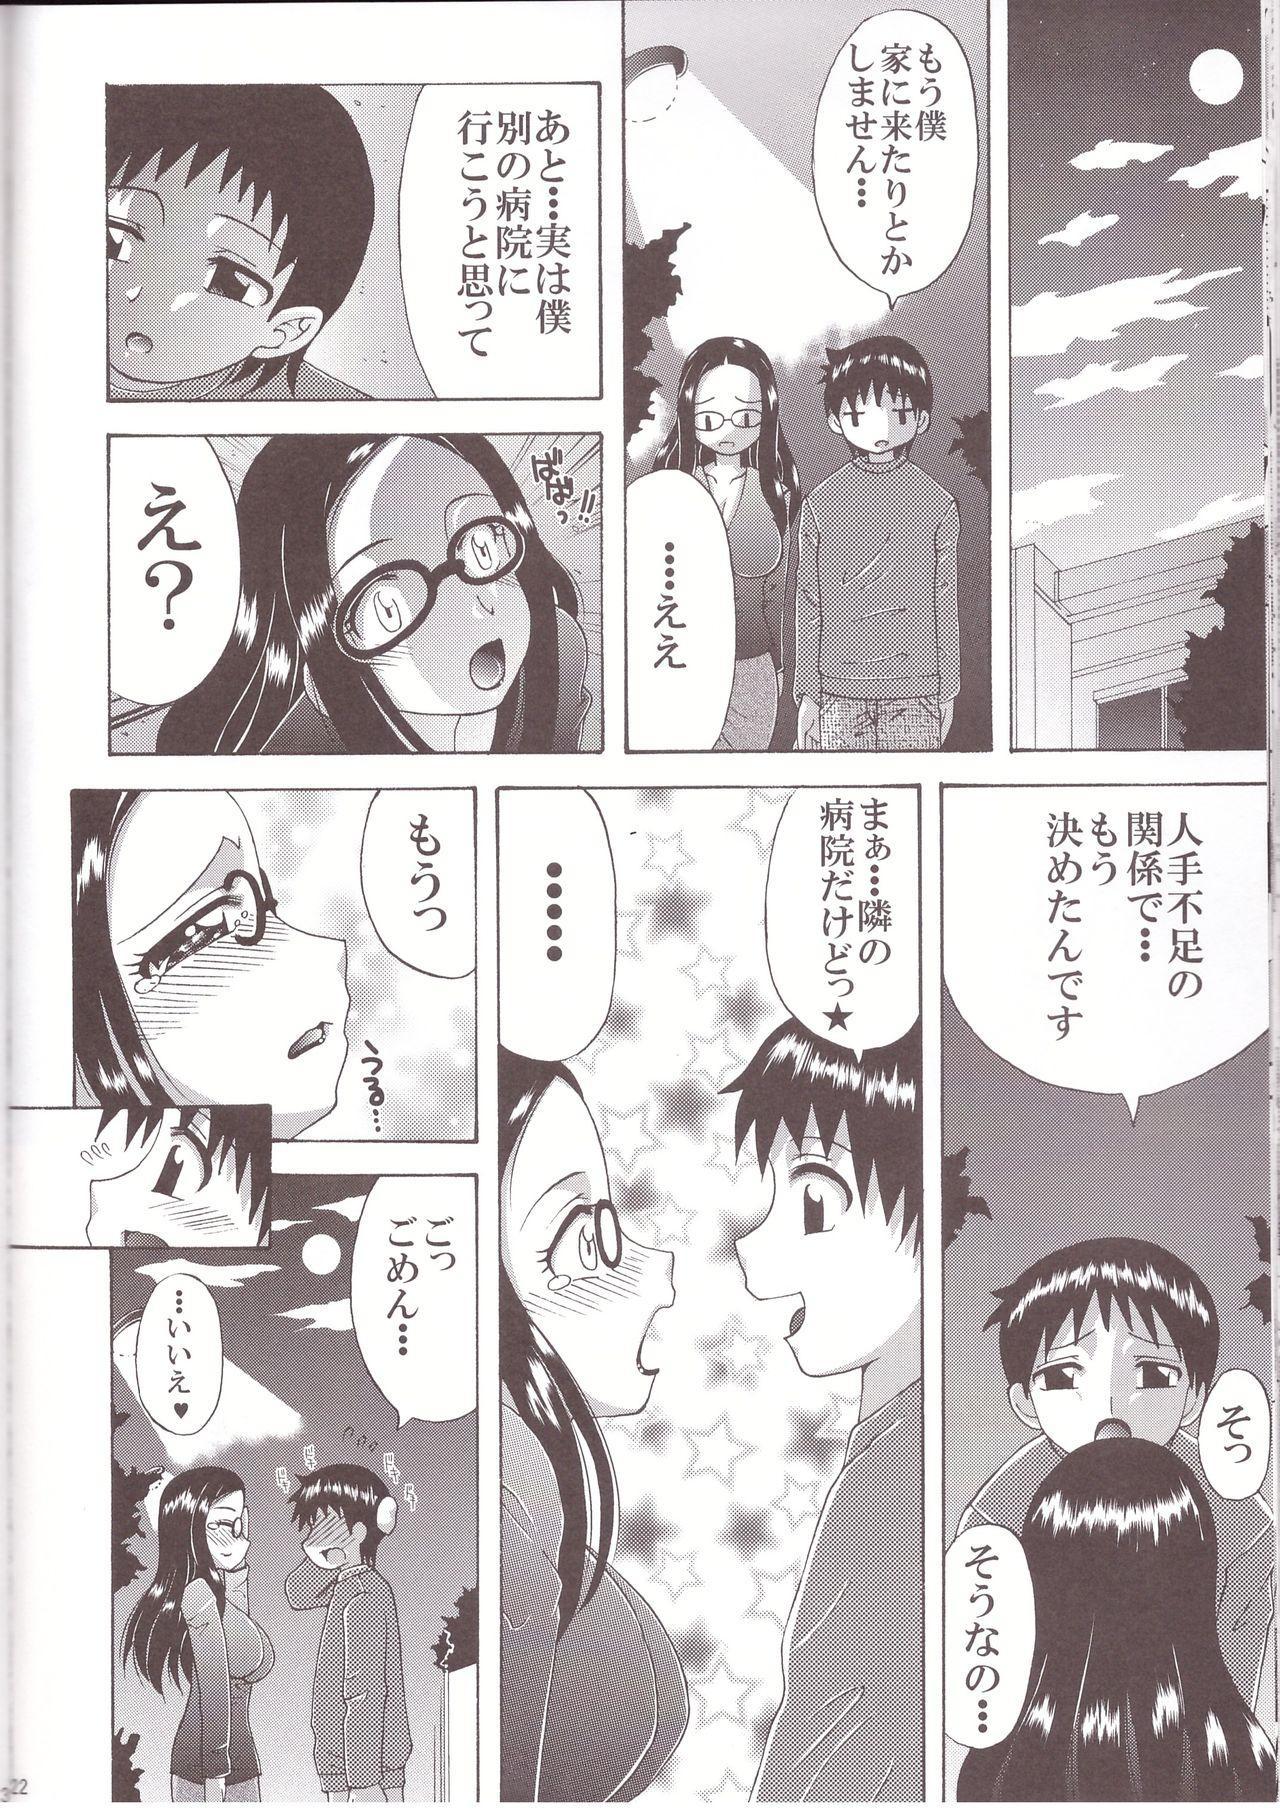 Tsuma koi2 21